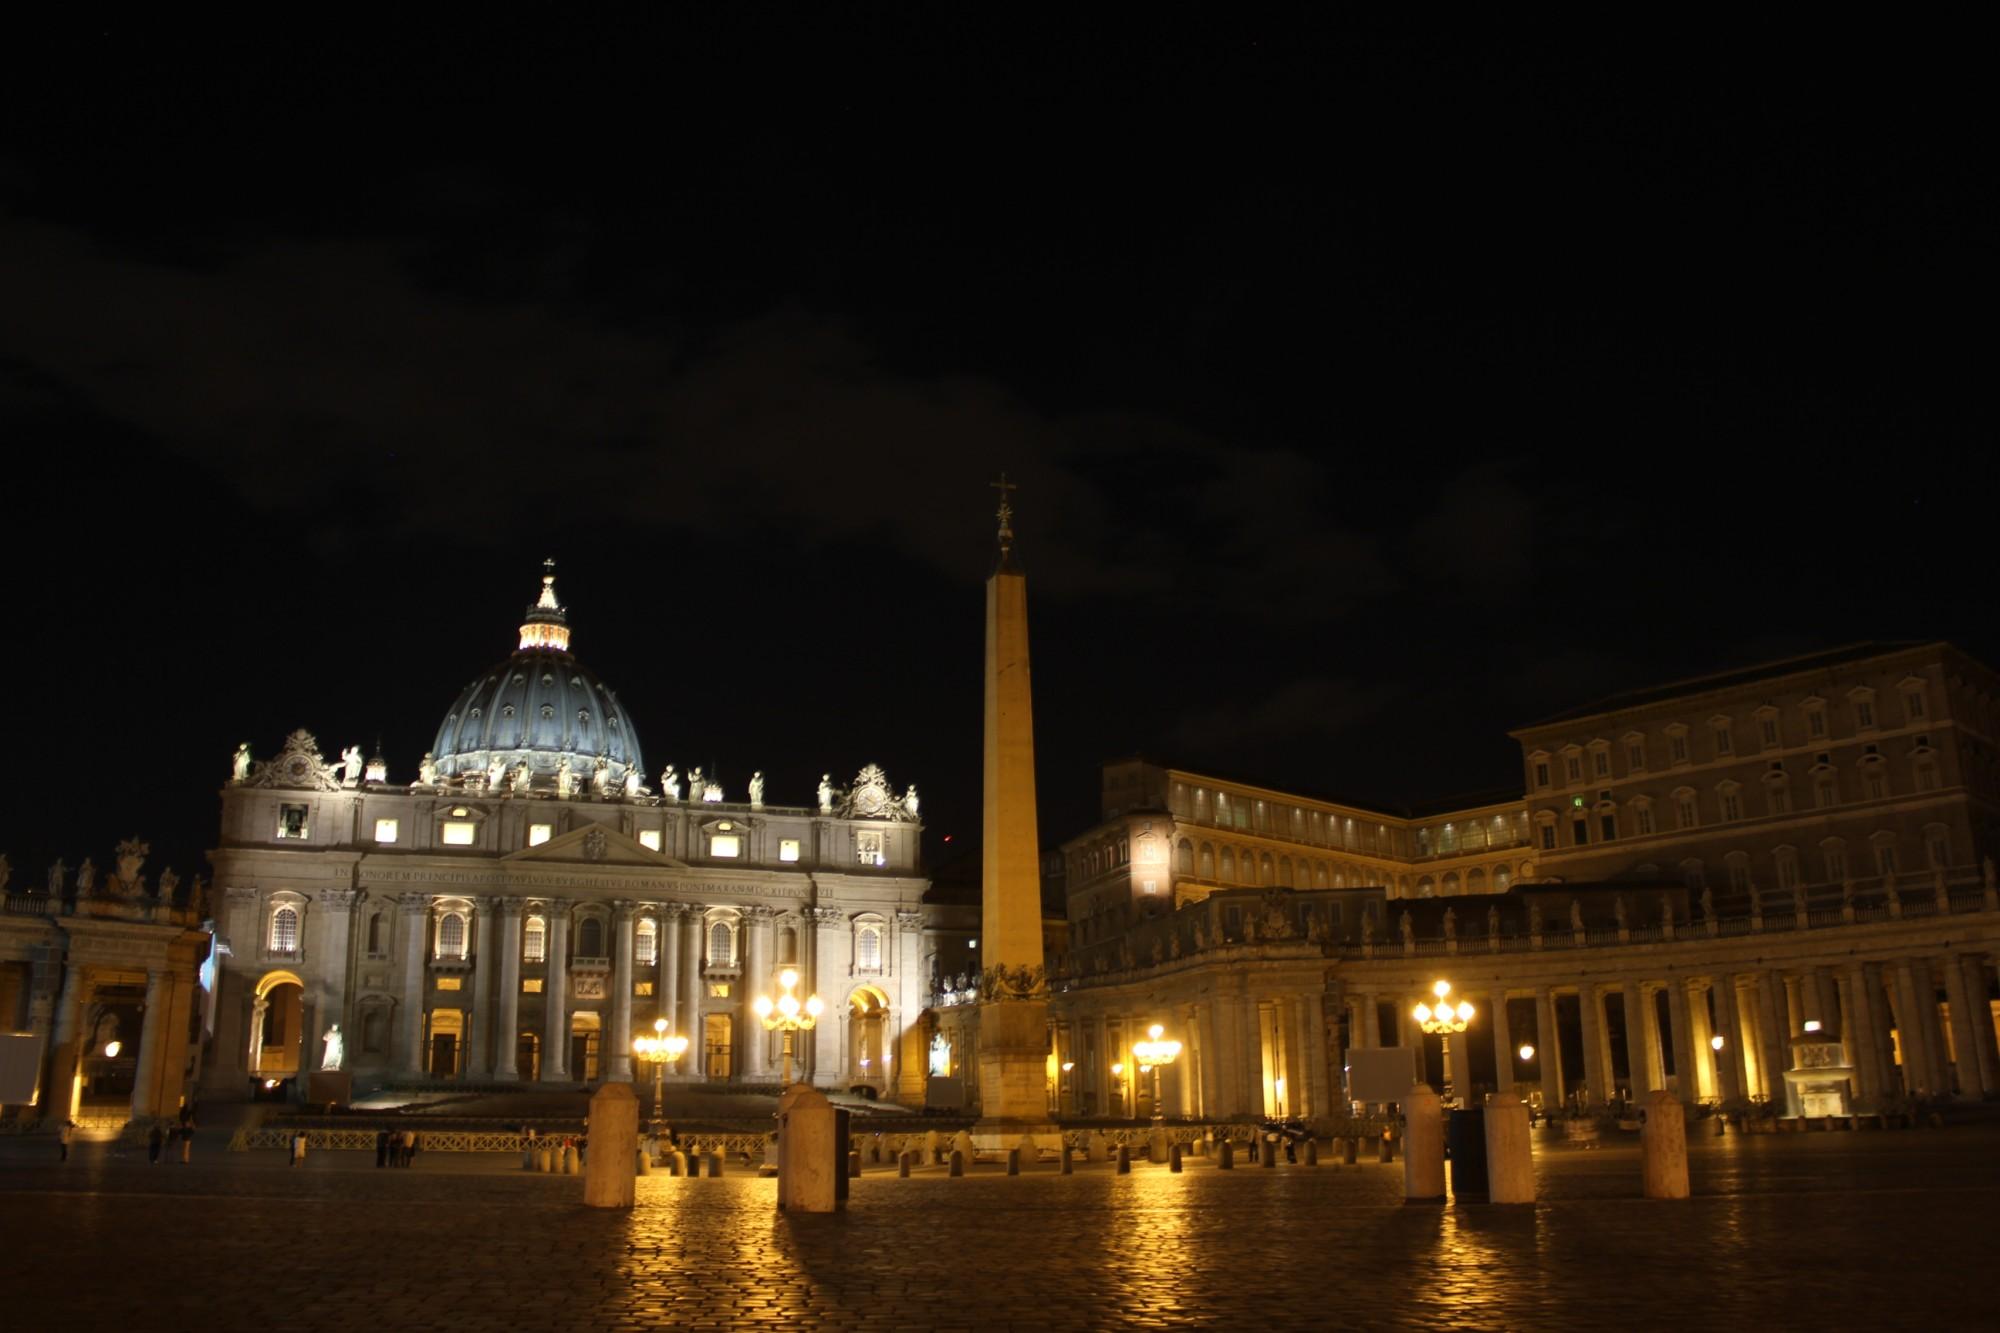 St Peter's square & Basilica